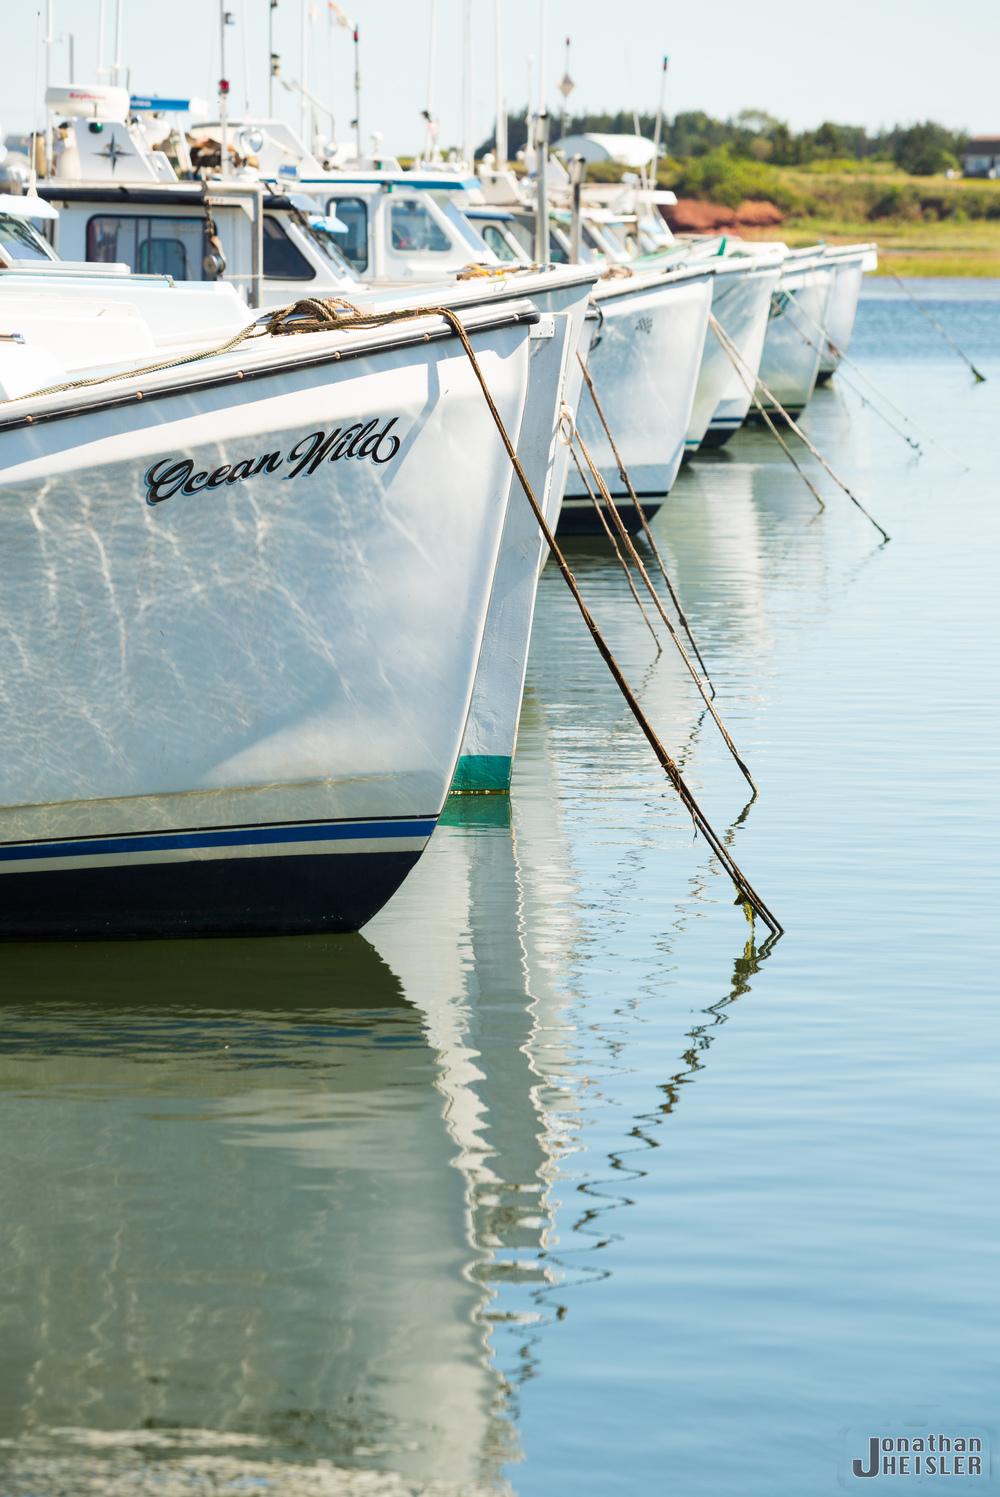 Prince Edward Island  _  Jonathan Heisler _ 8.24.2013 _ 00089.jpg